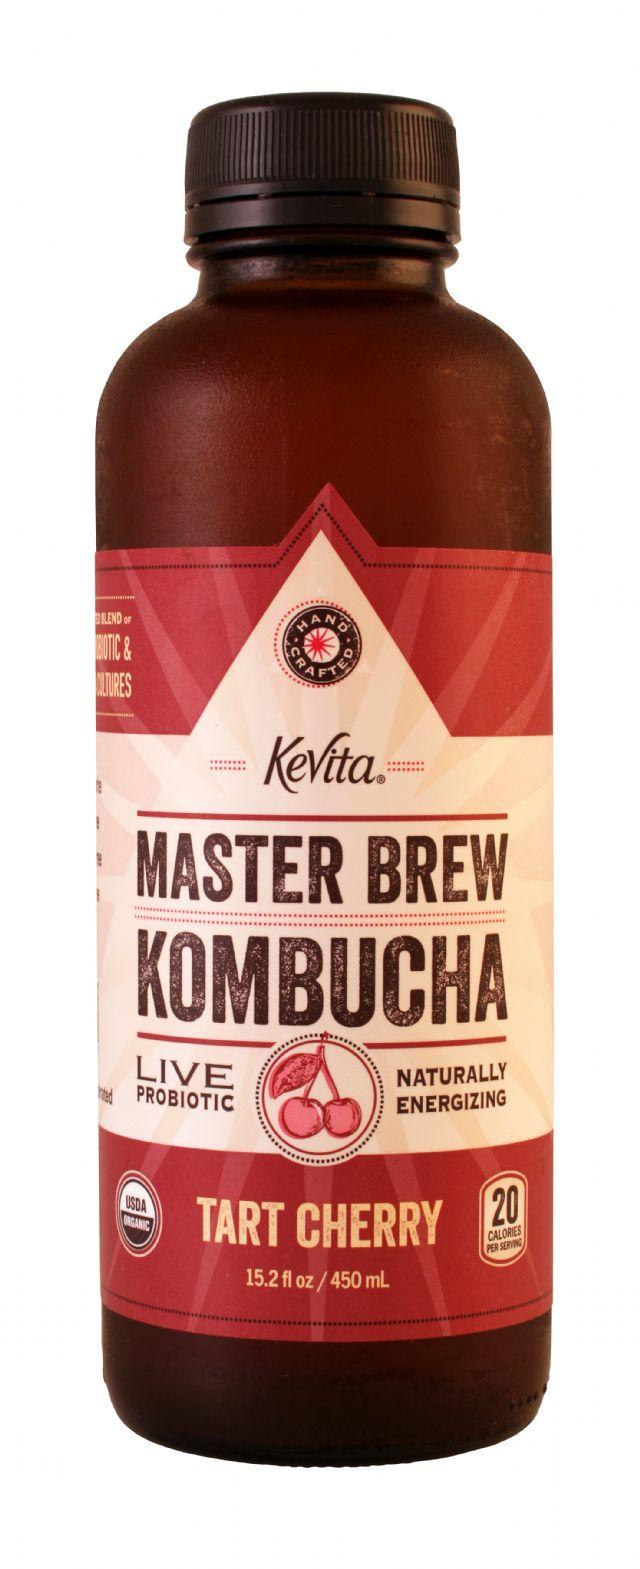 KeVita Master Brew Kombucha: Kevita TartCherry Front